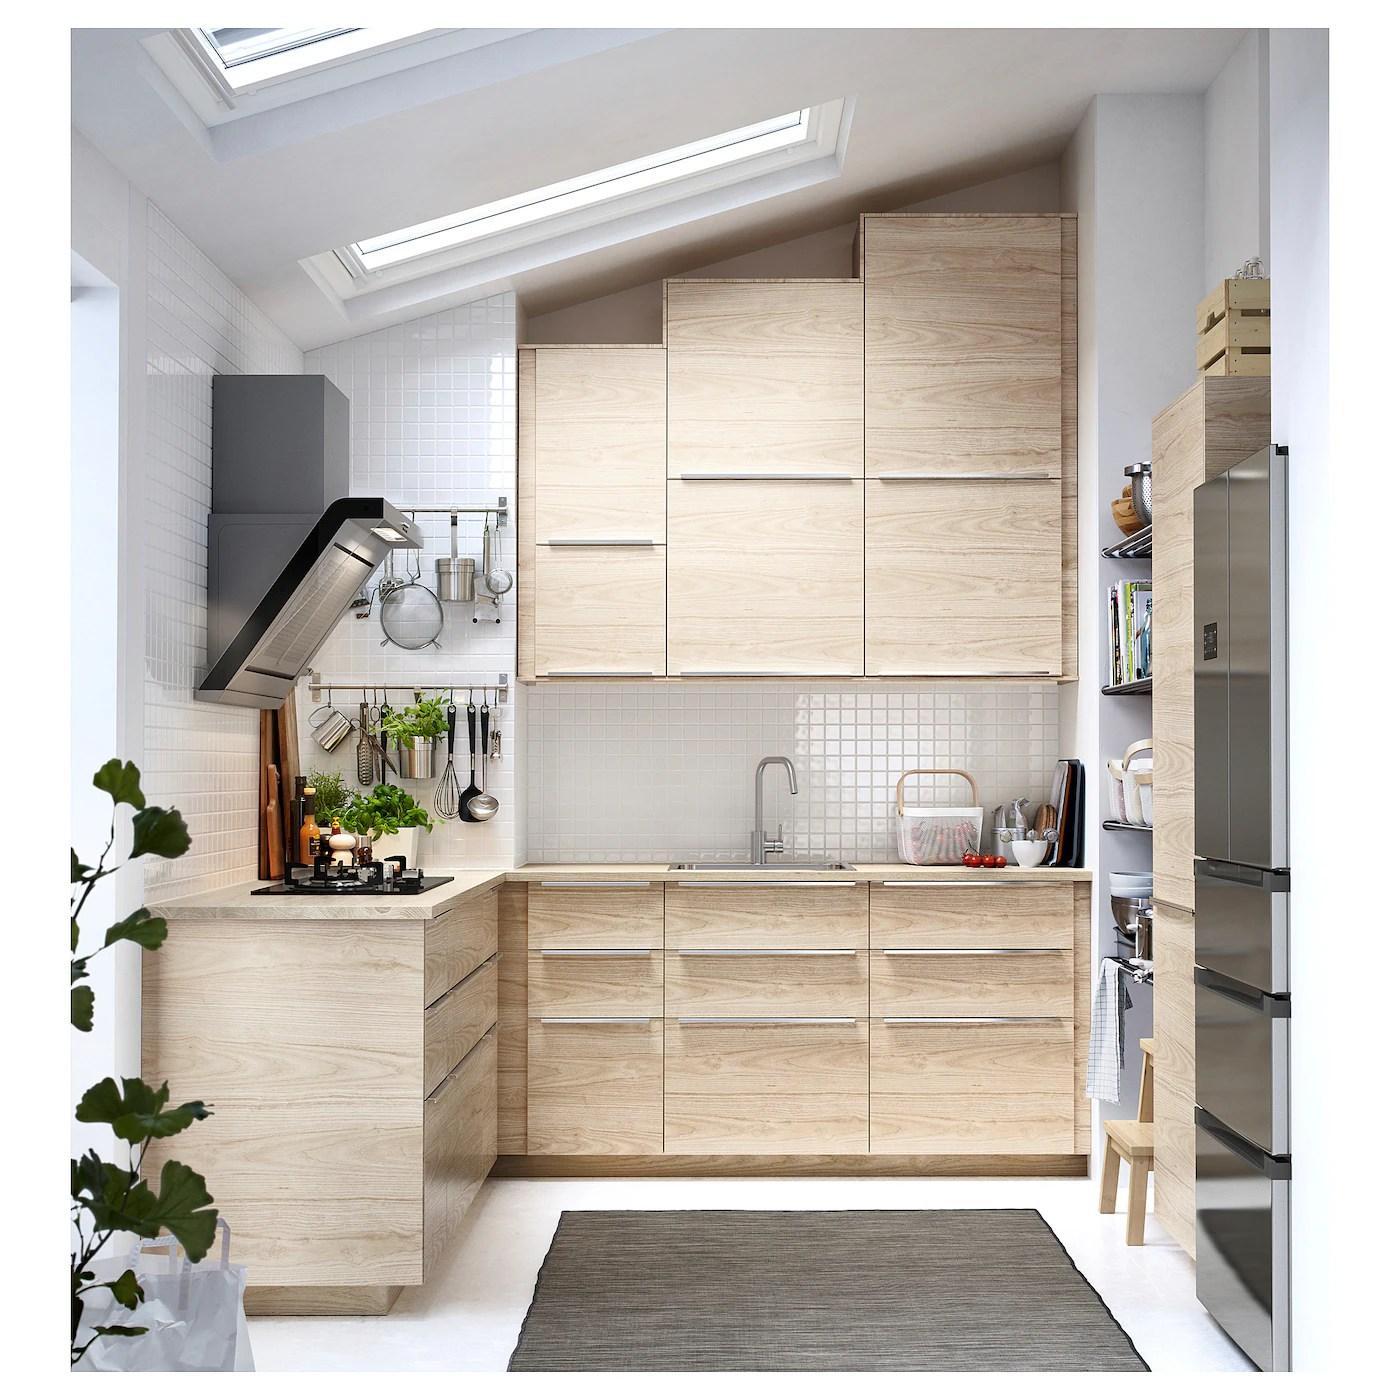 Ekbacken Plan De Travail Decor Frene Stratifie 246x2 Ikea